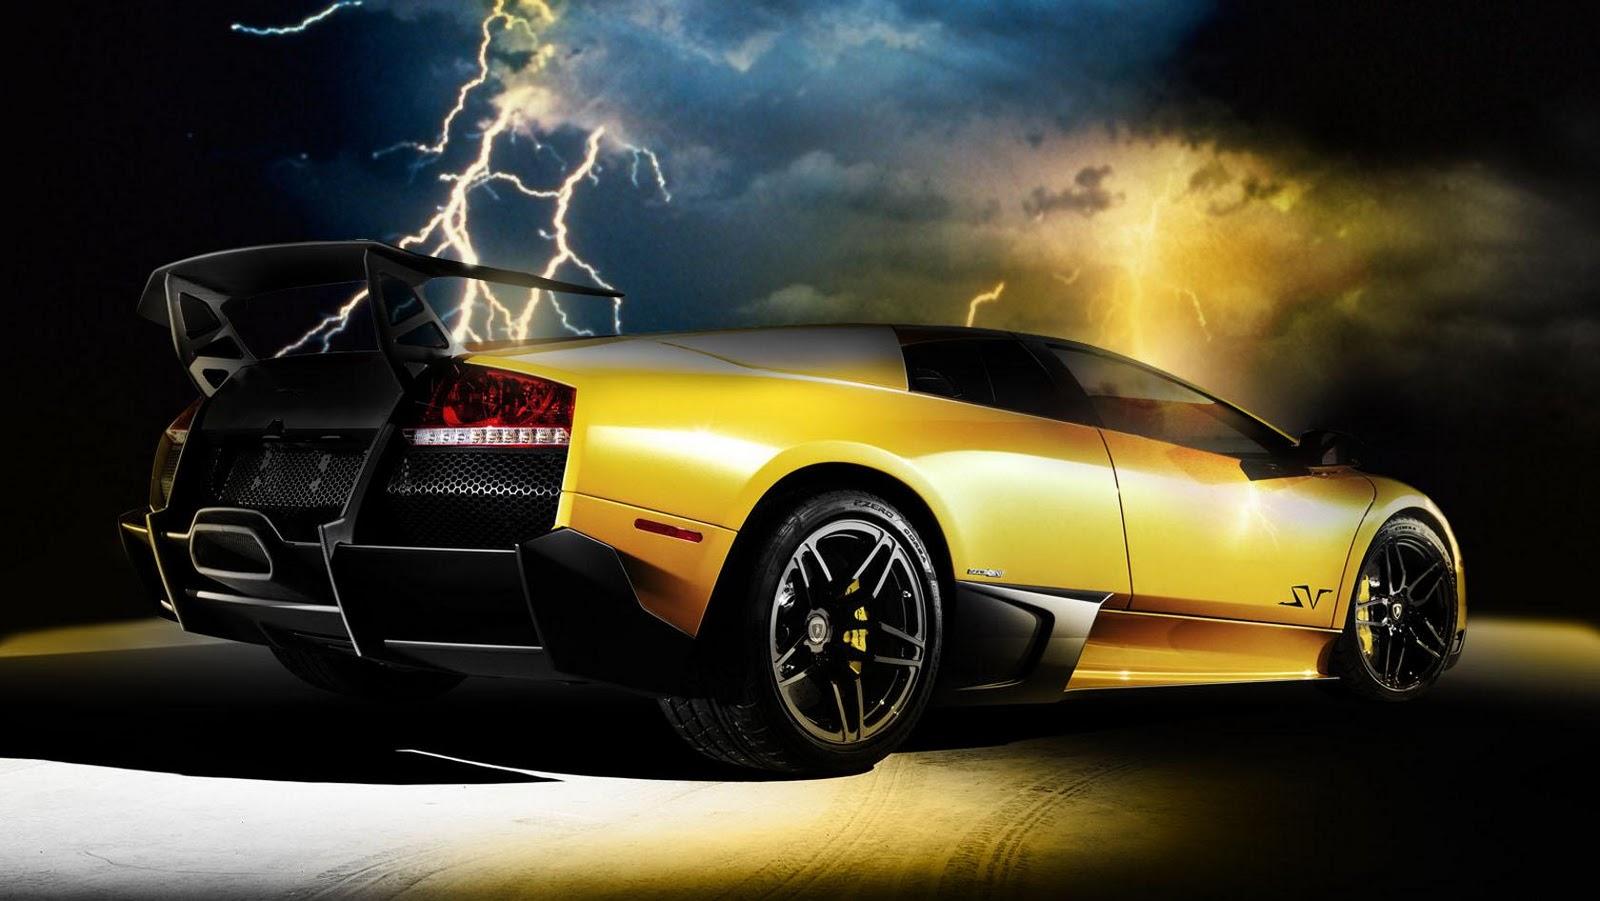 Free Download Gold And Black Lamborghini Wallpaper 1 Hd